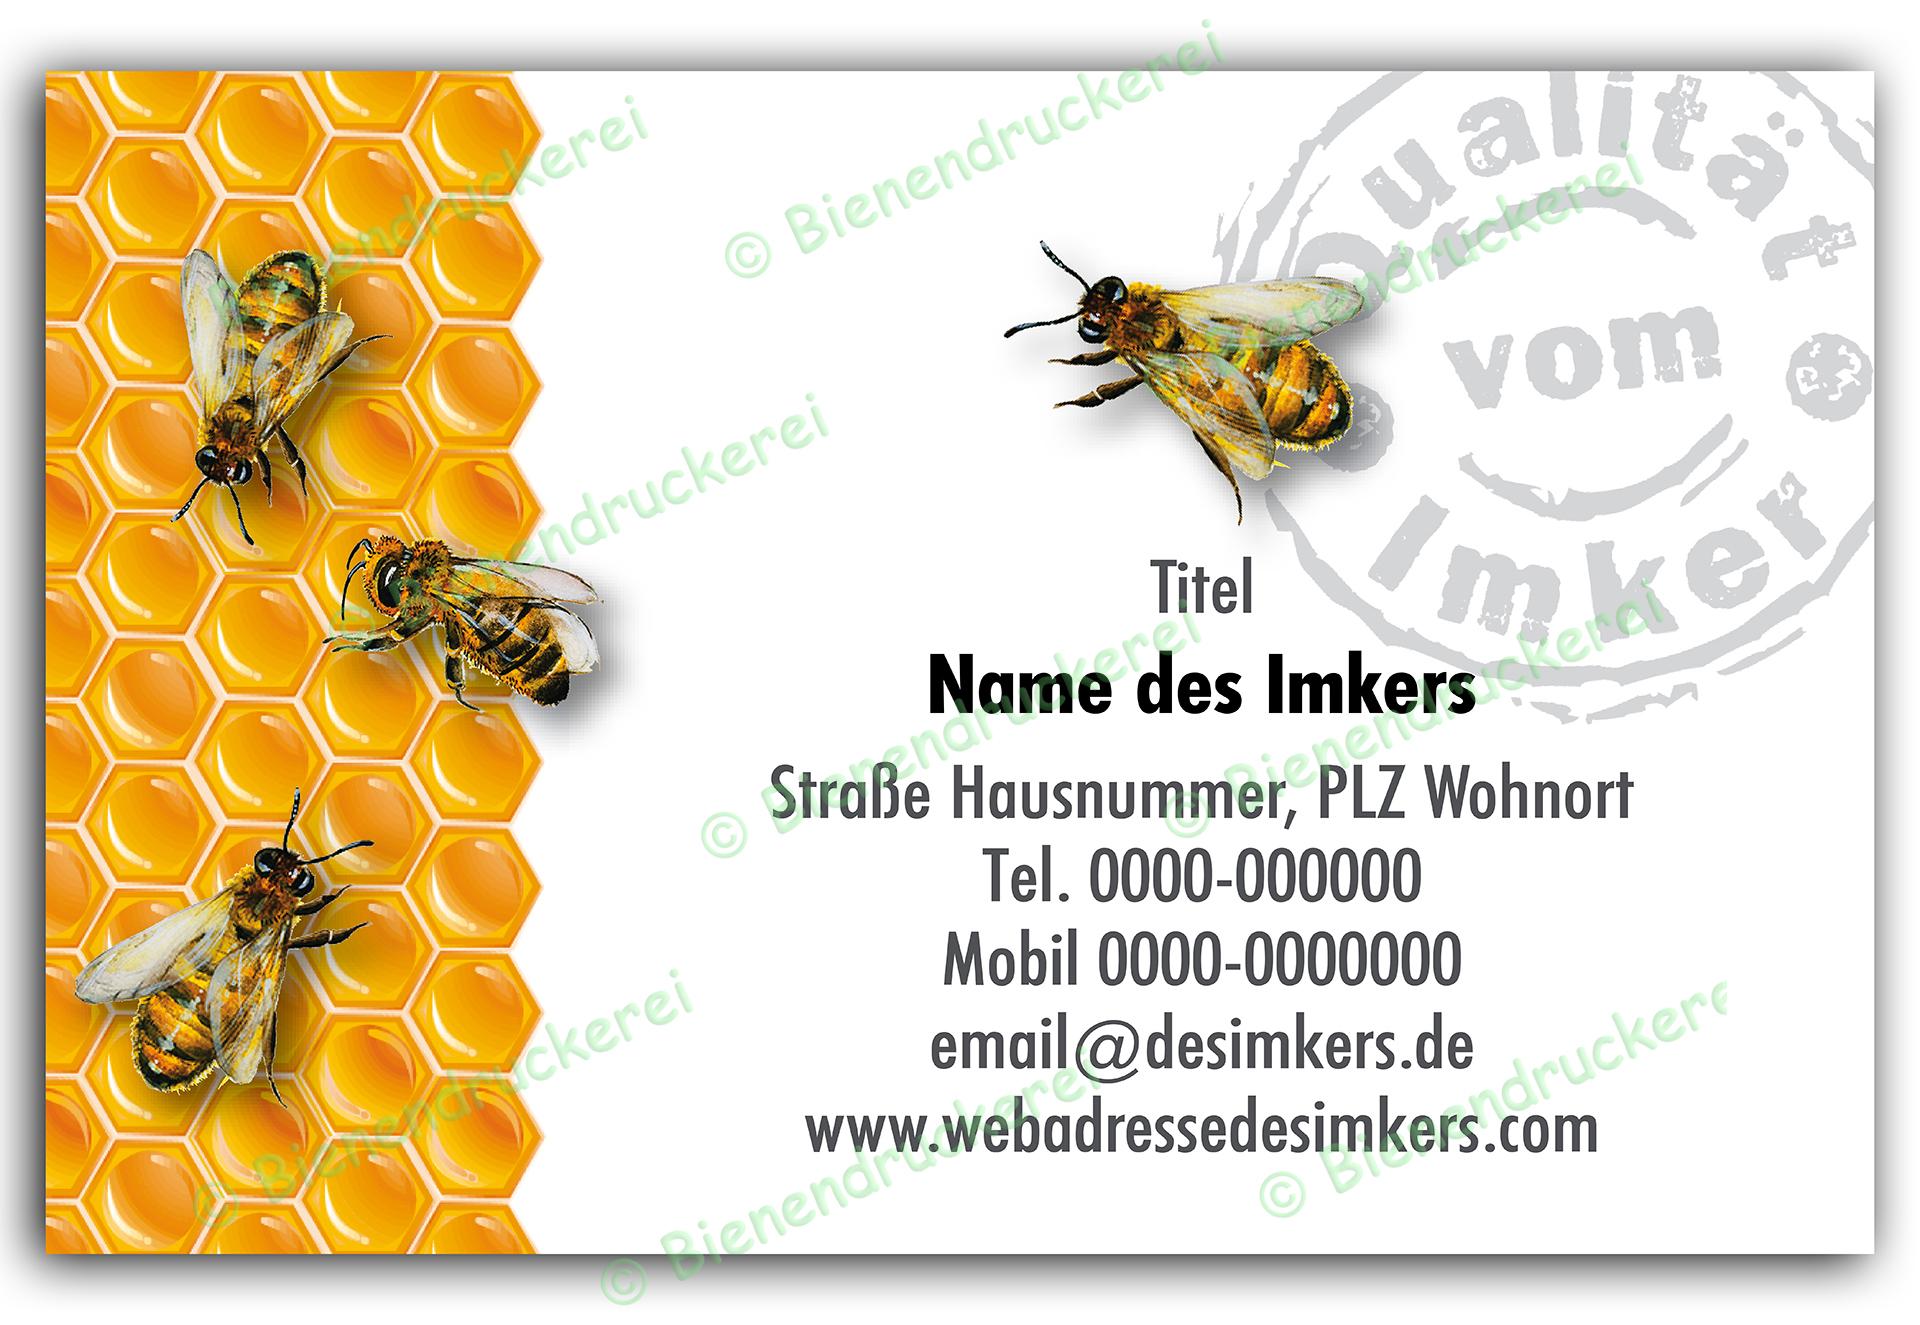 Bienendruckerei